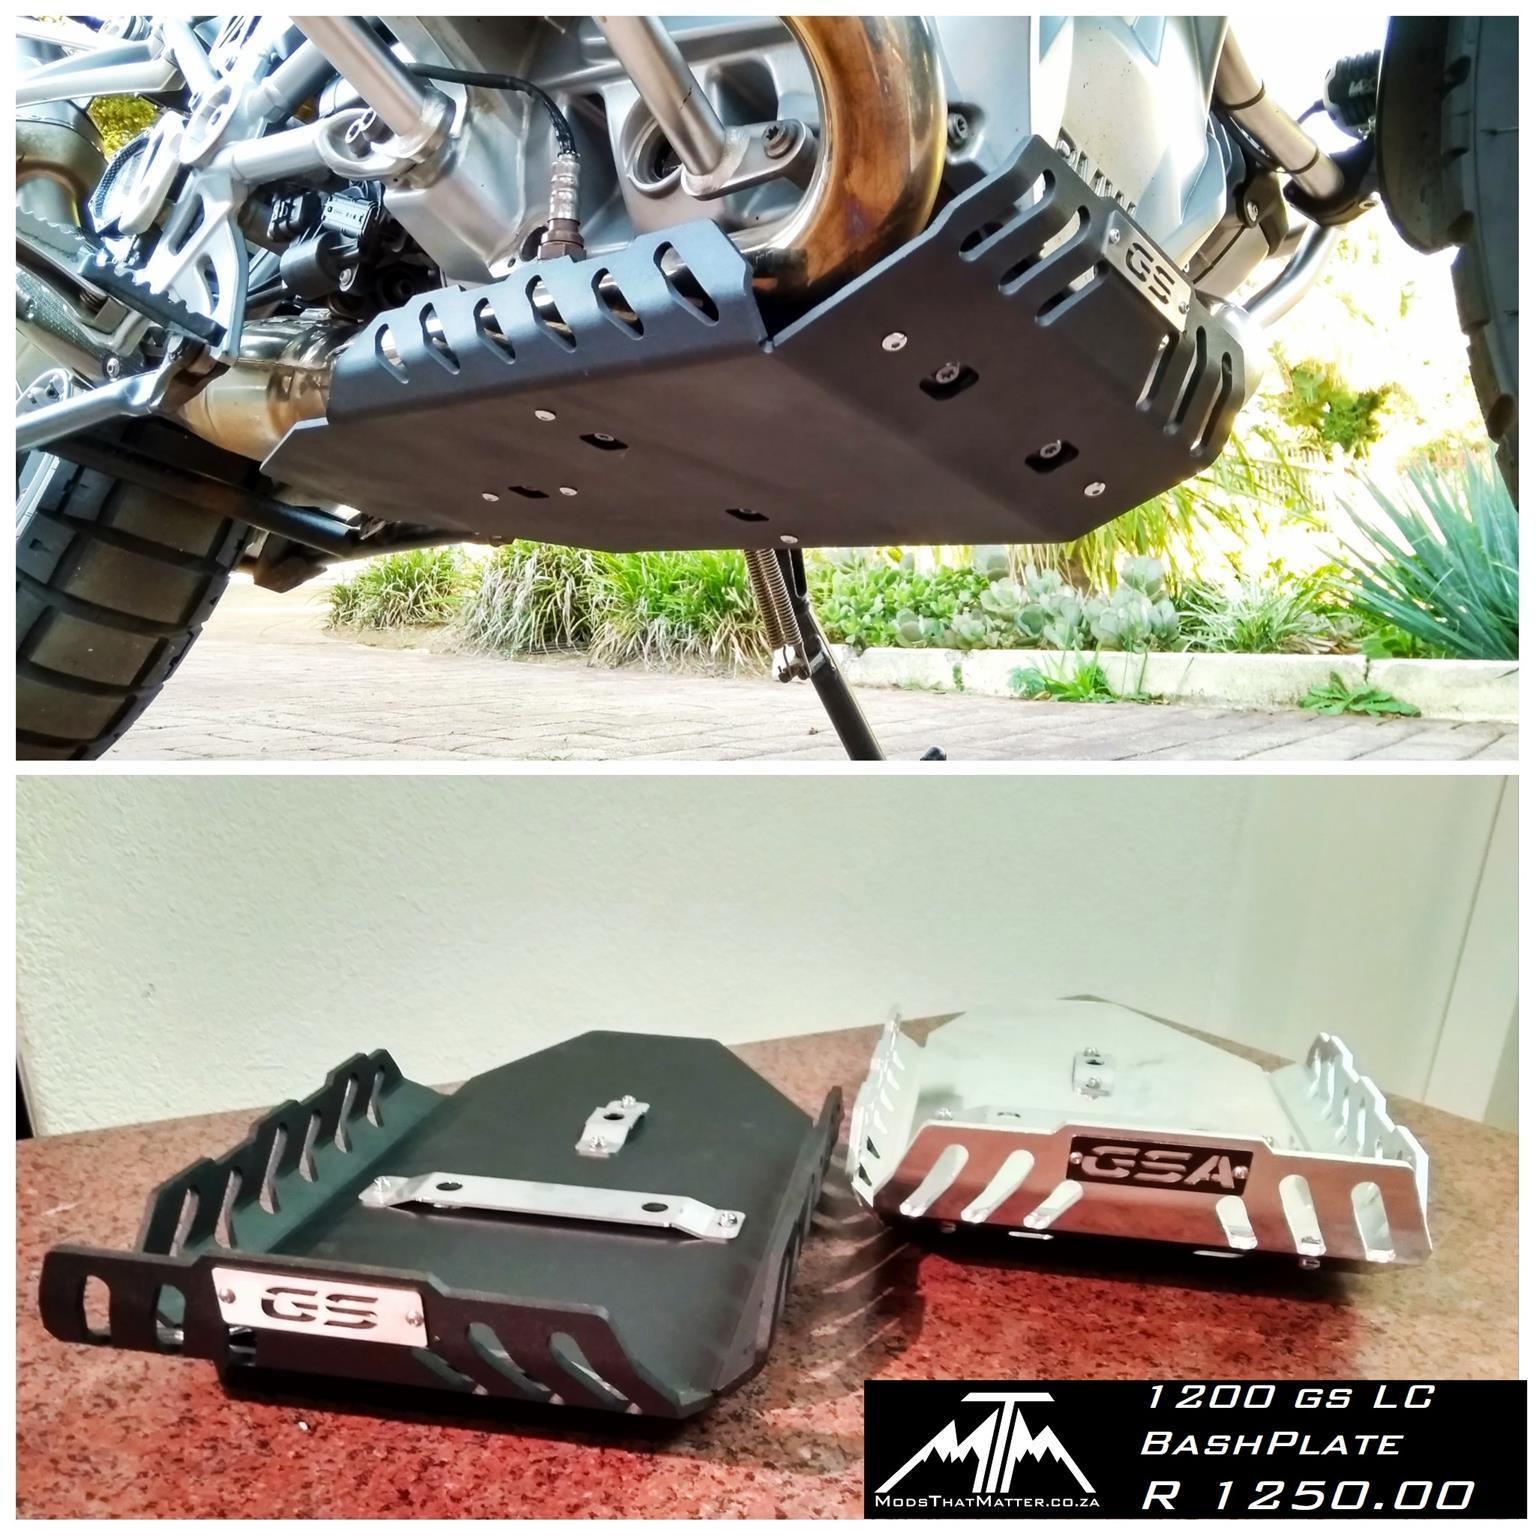 BMW F800, 1200GS Accessories